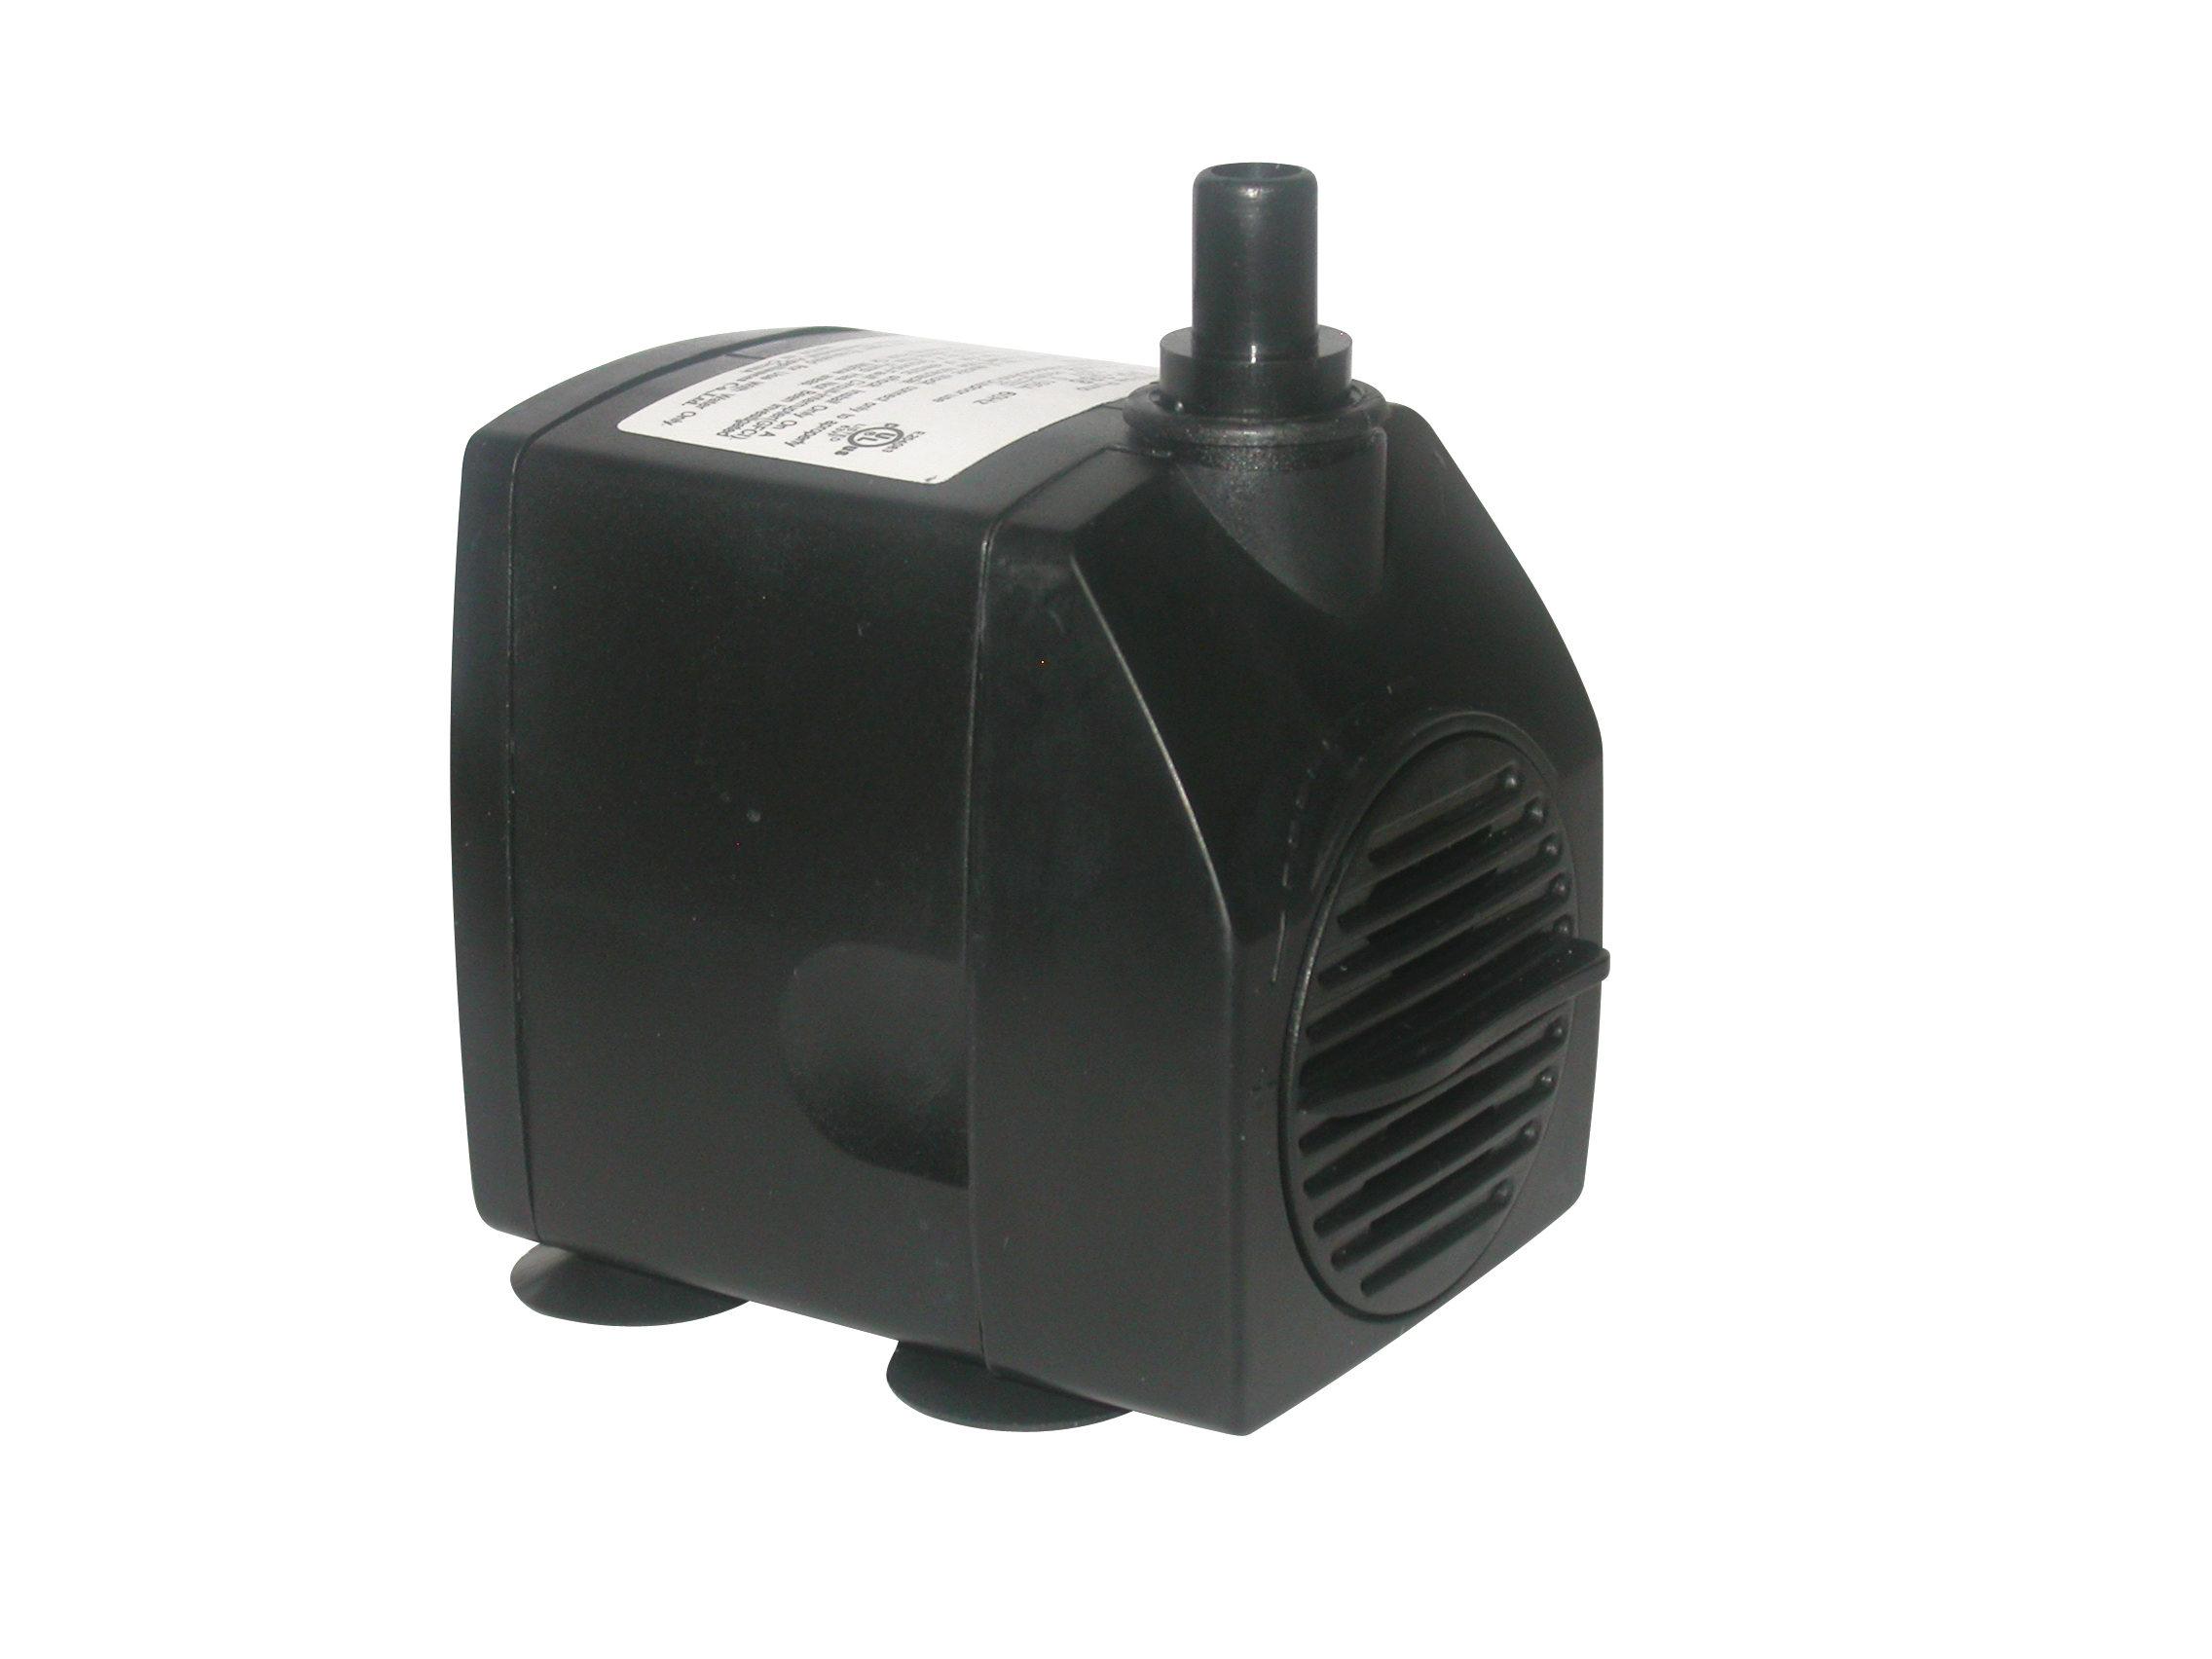 180 GPH Power Head Pump with 6 Ft. Cord